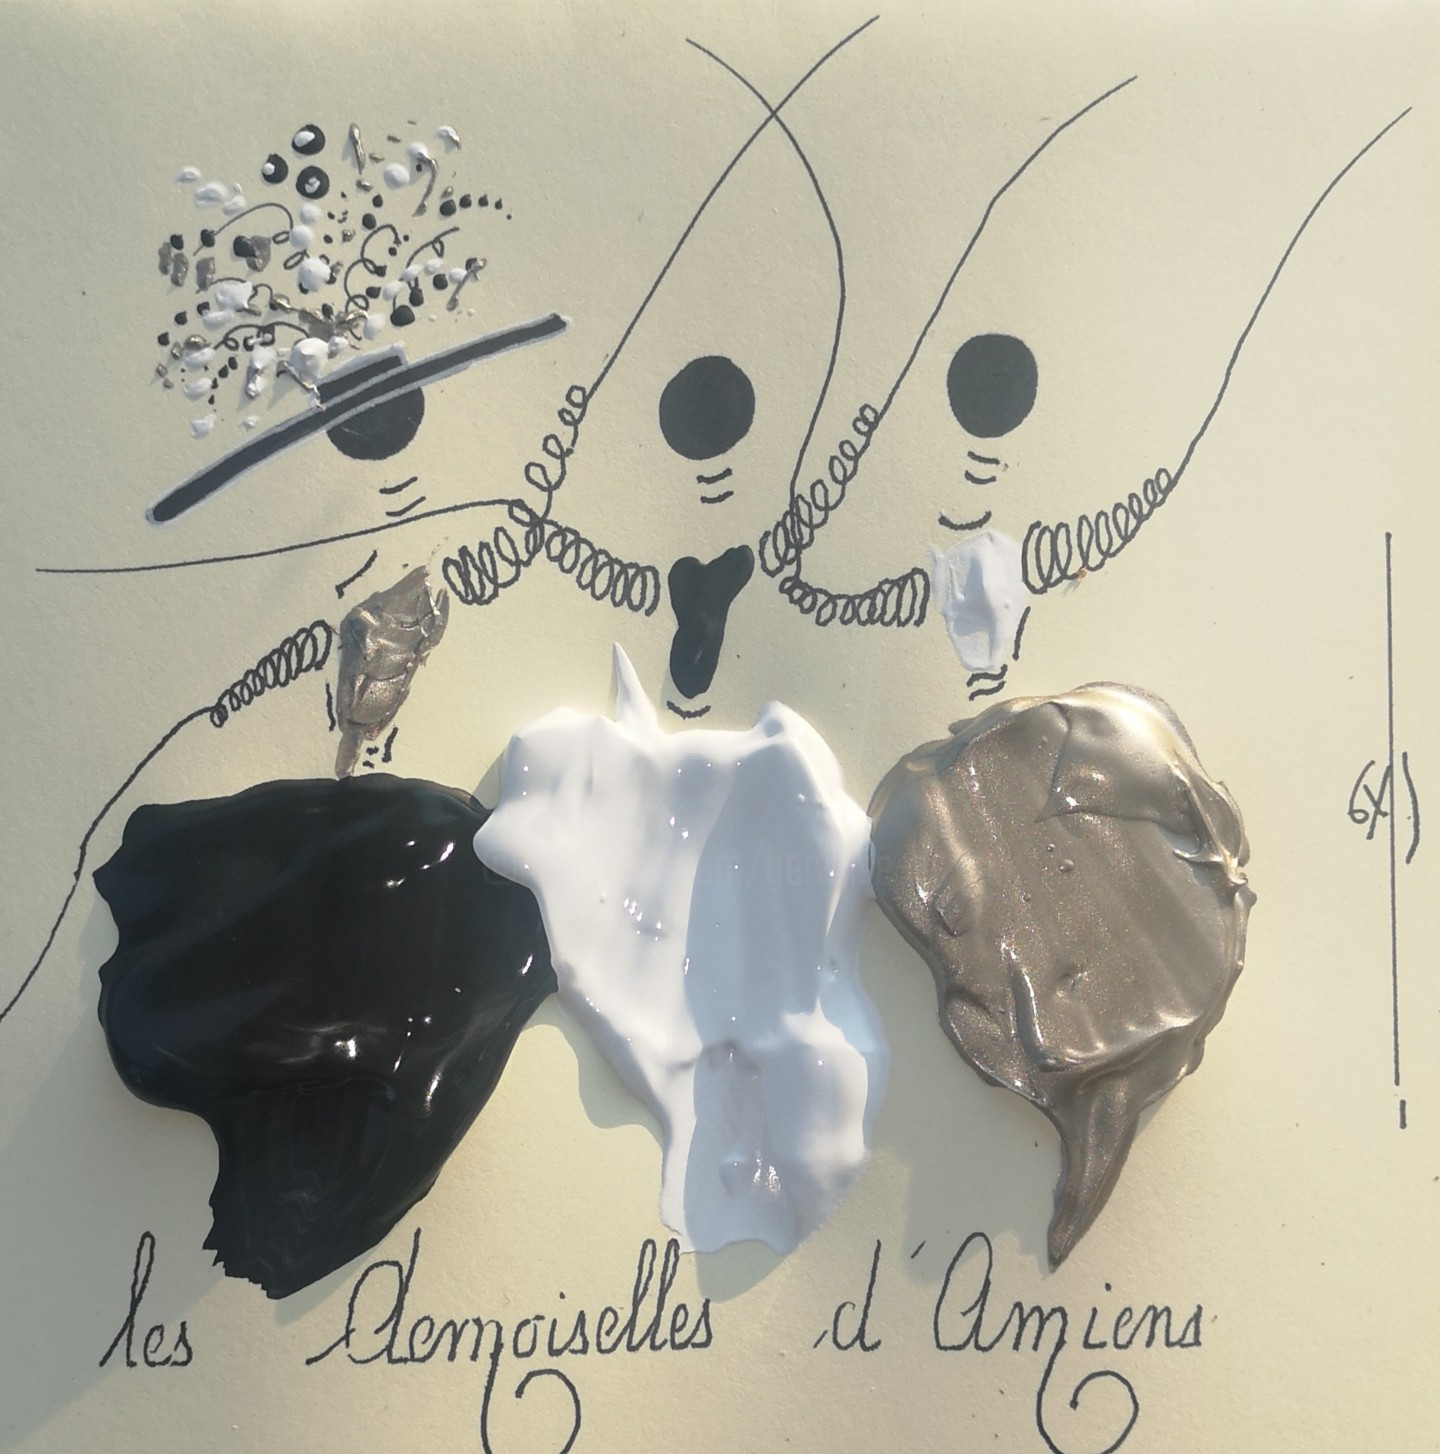 GAS - Les Demoiselles d'Amiens. ref 20200403 lda